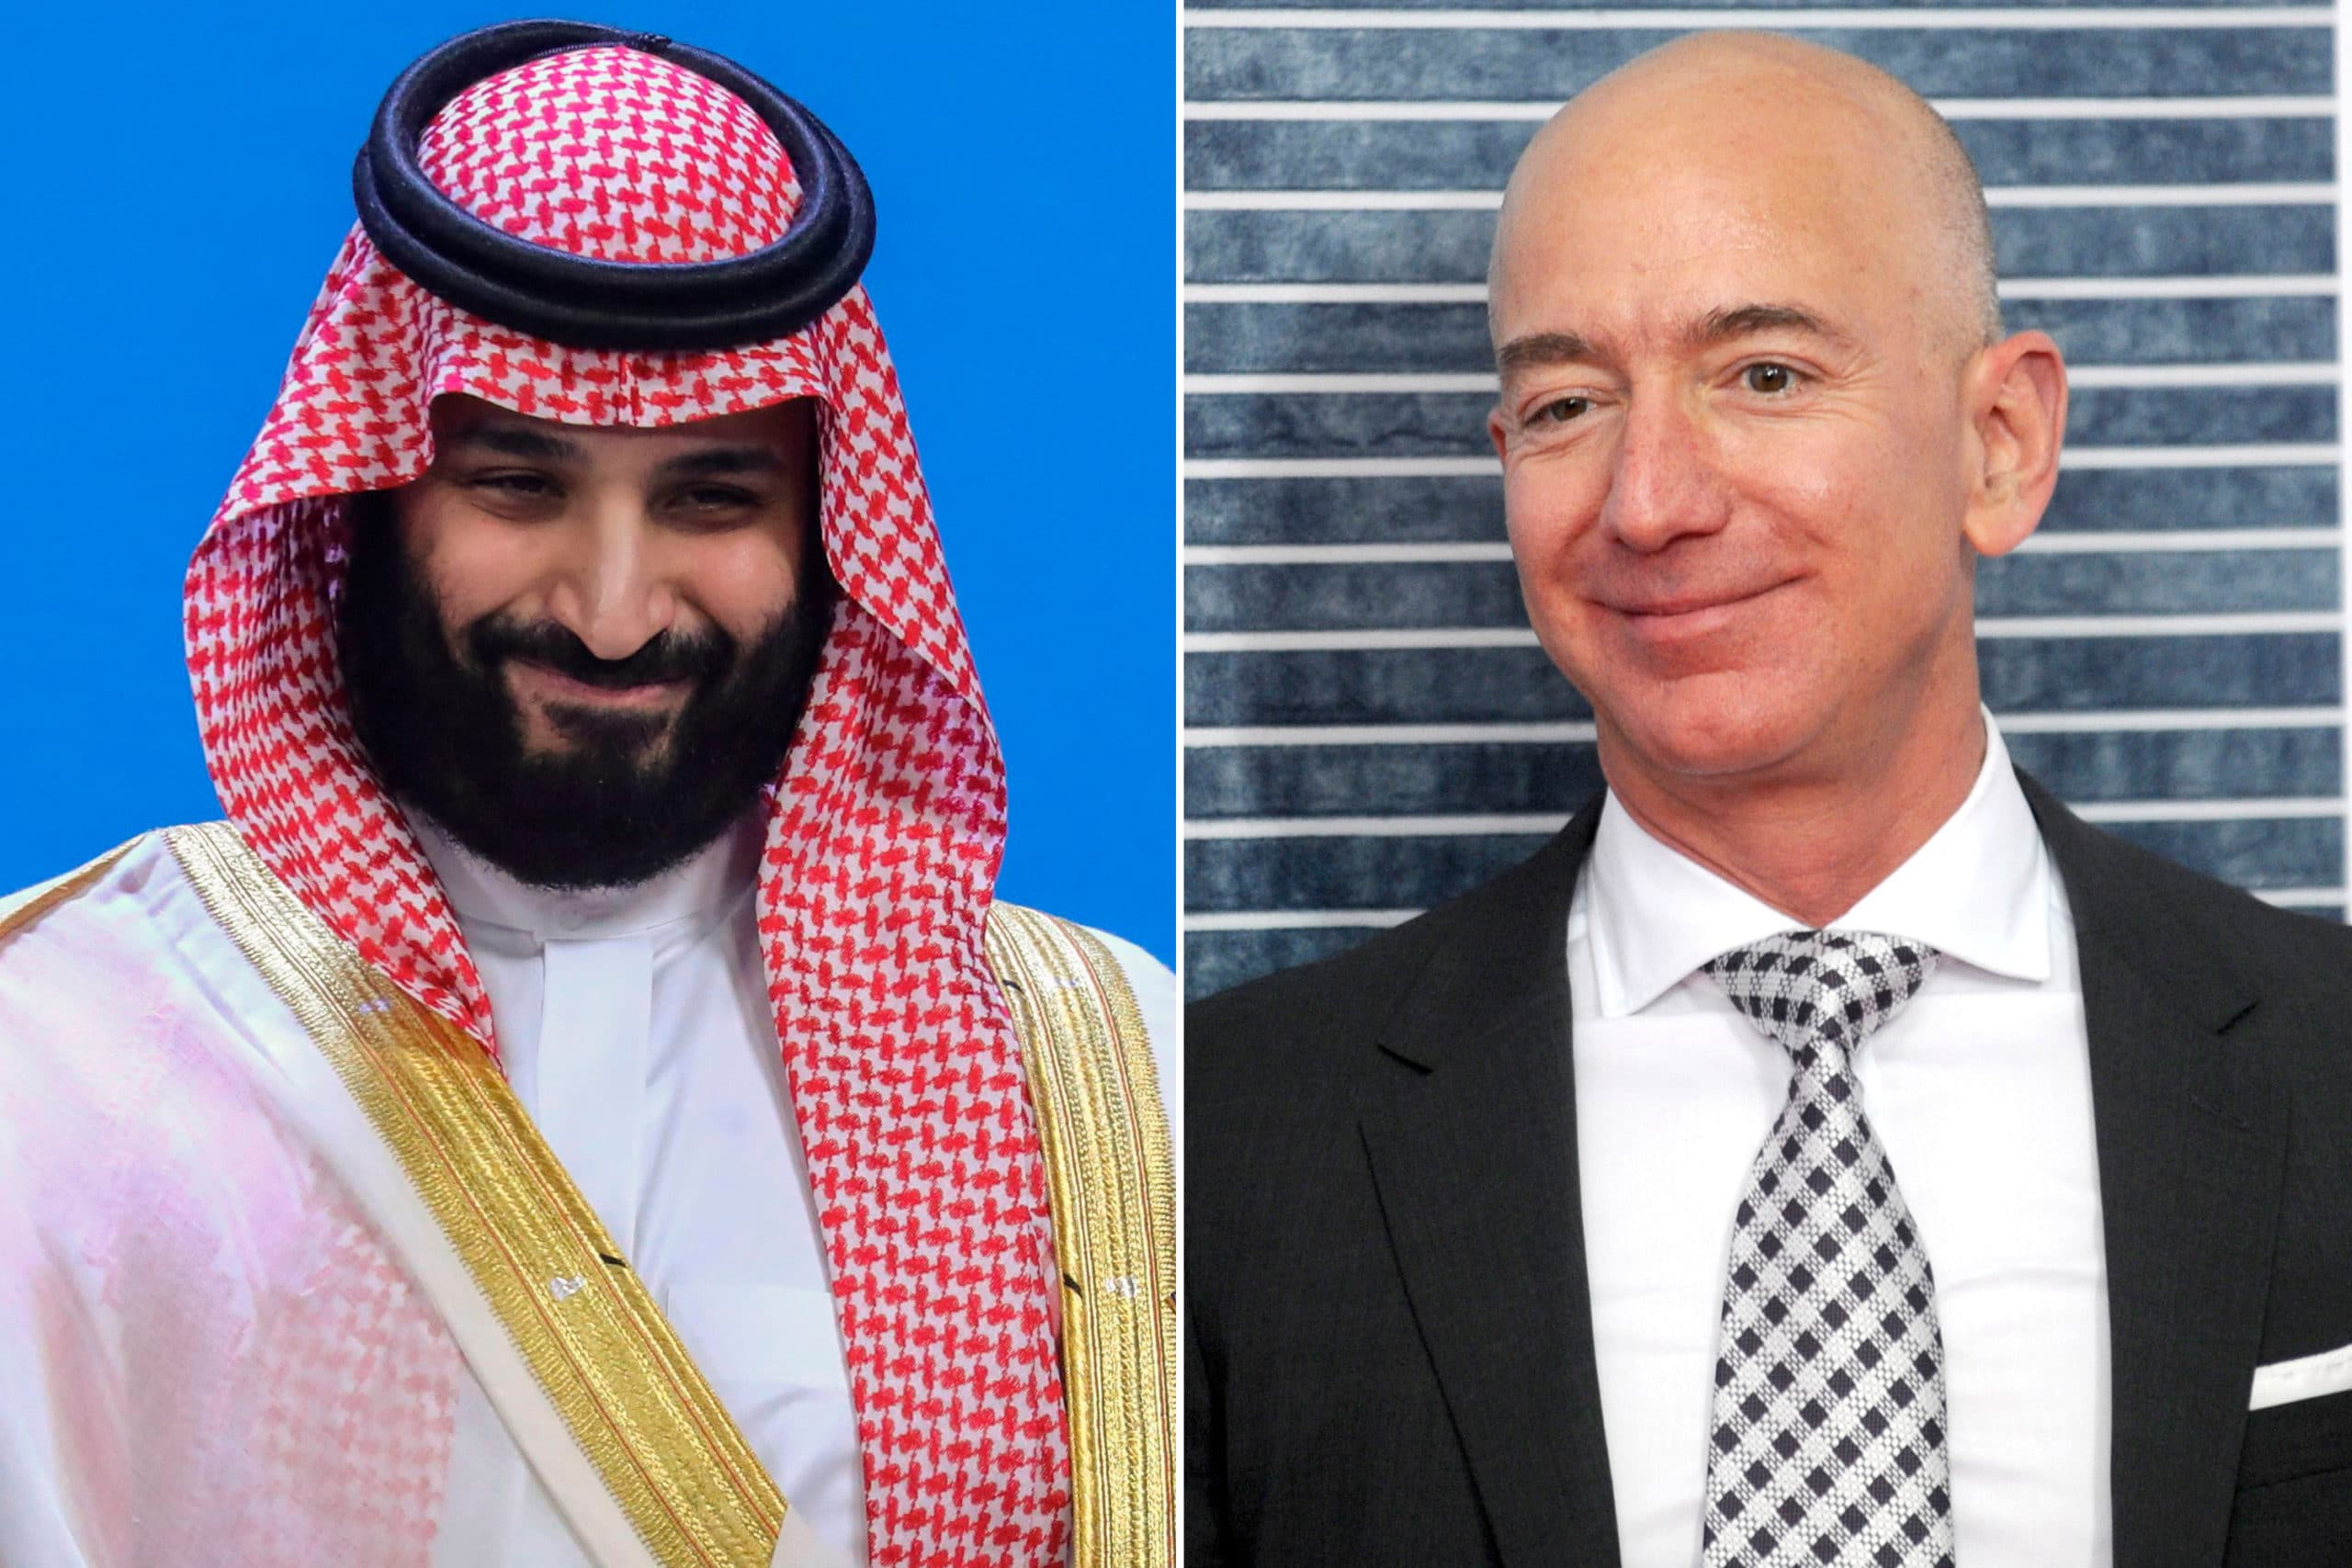 Jeff Bezos e Mohammed bin Salman